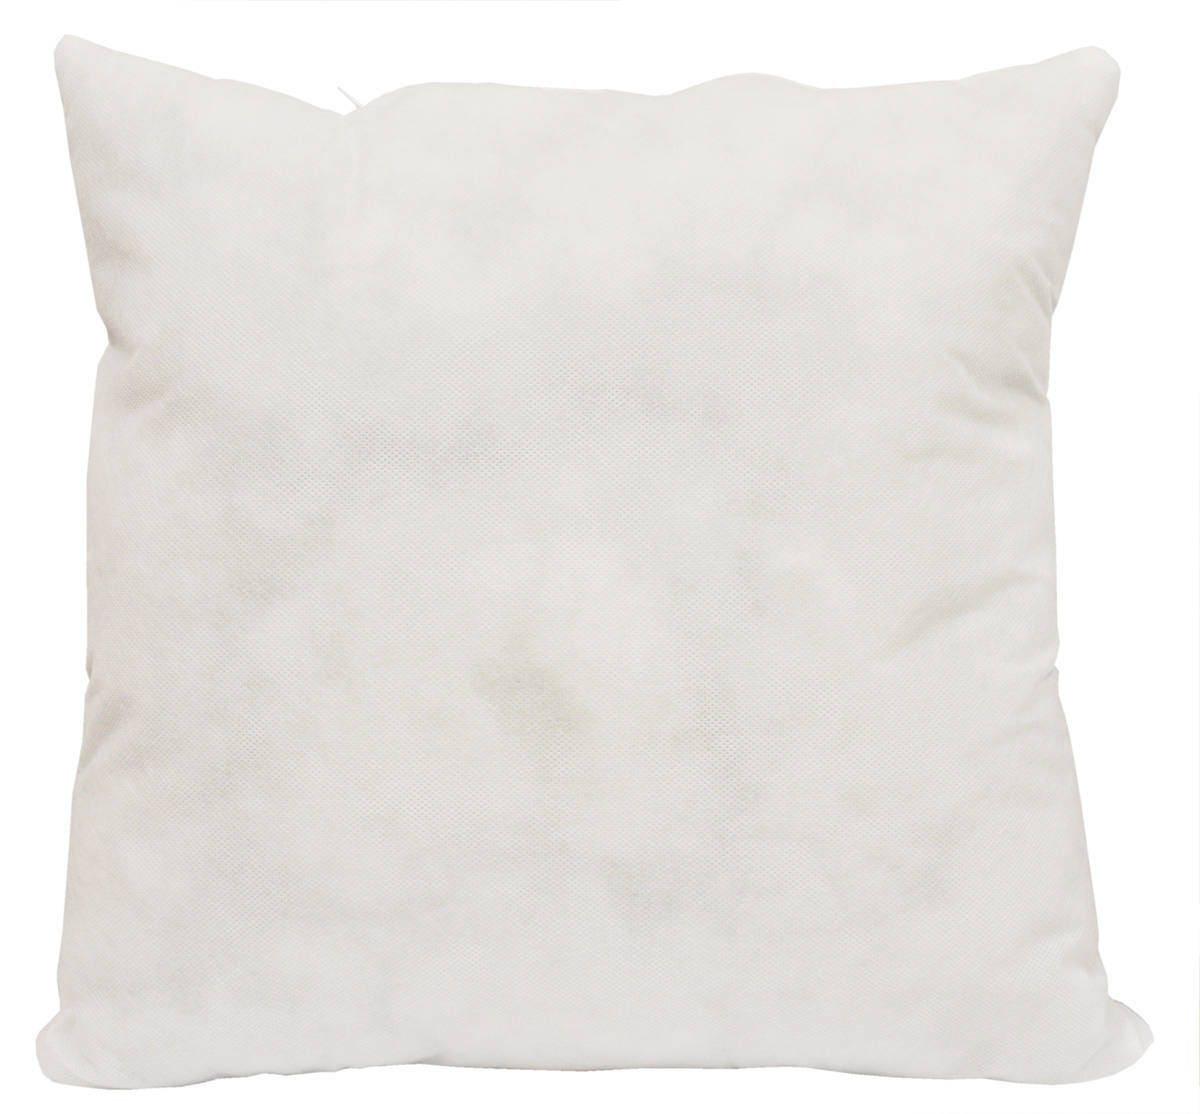 18 x 18 throw pillow insert 18 x 18 pillow etsy. Black Bedroom Furniture Sets. Home Design Ideas